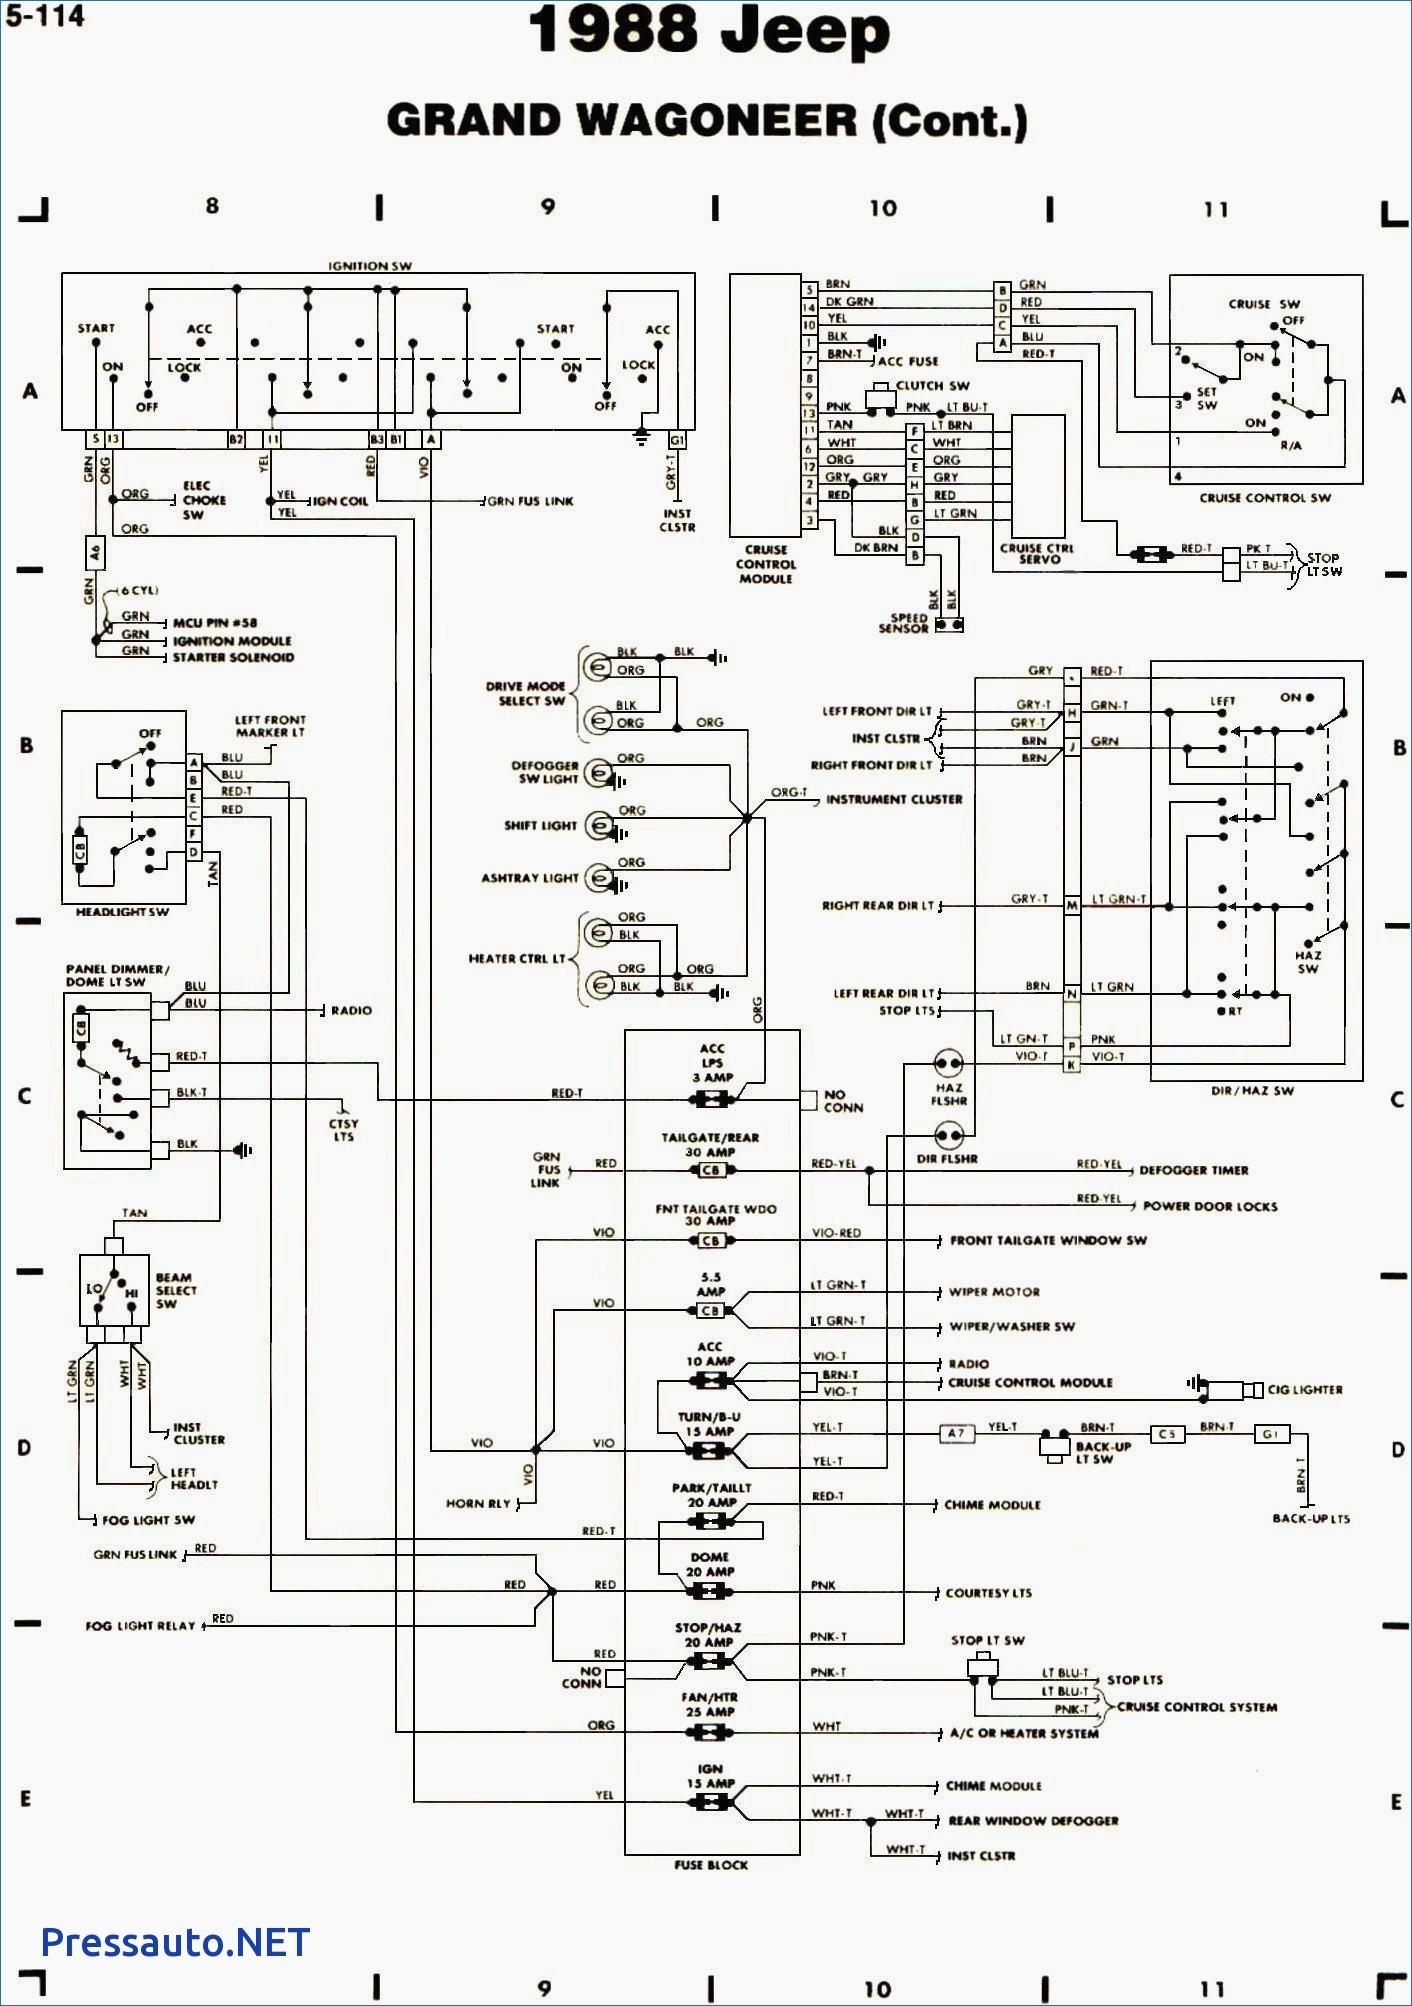 1992 Freightliner Fld Brake Light Wiring Diagram Diagram] Freightliner M2 Radio Wiring Diagram Hd Version Of 1992 Freightliner Fld Brake Light Wiring Diagram